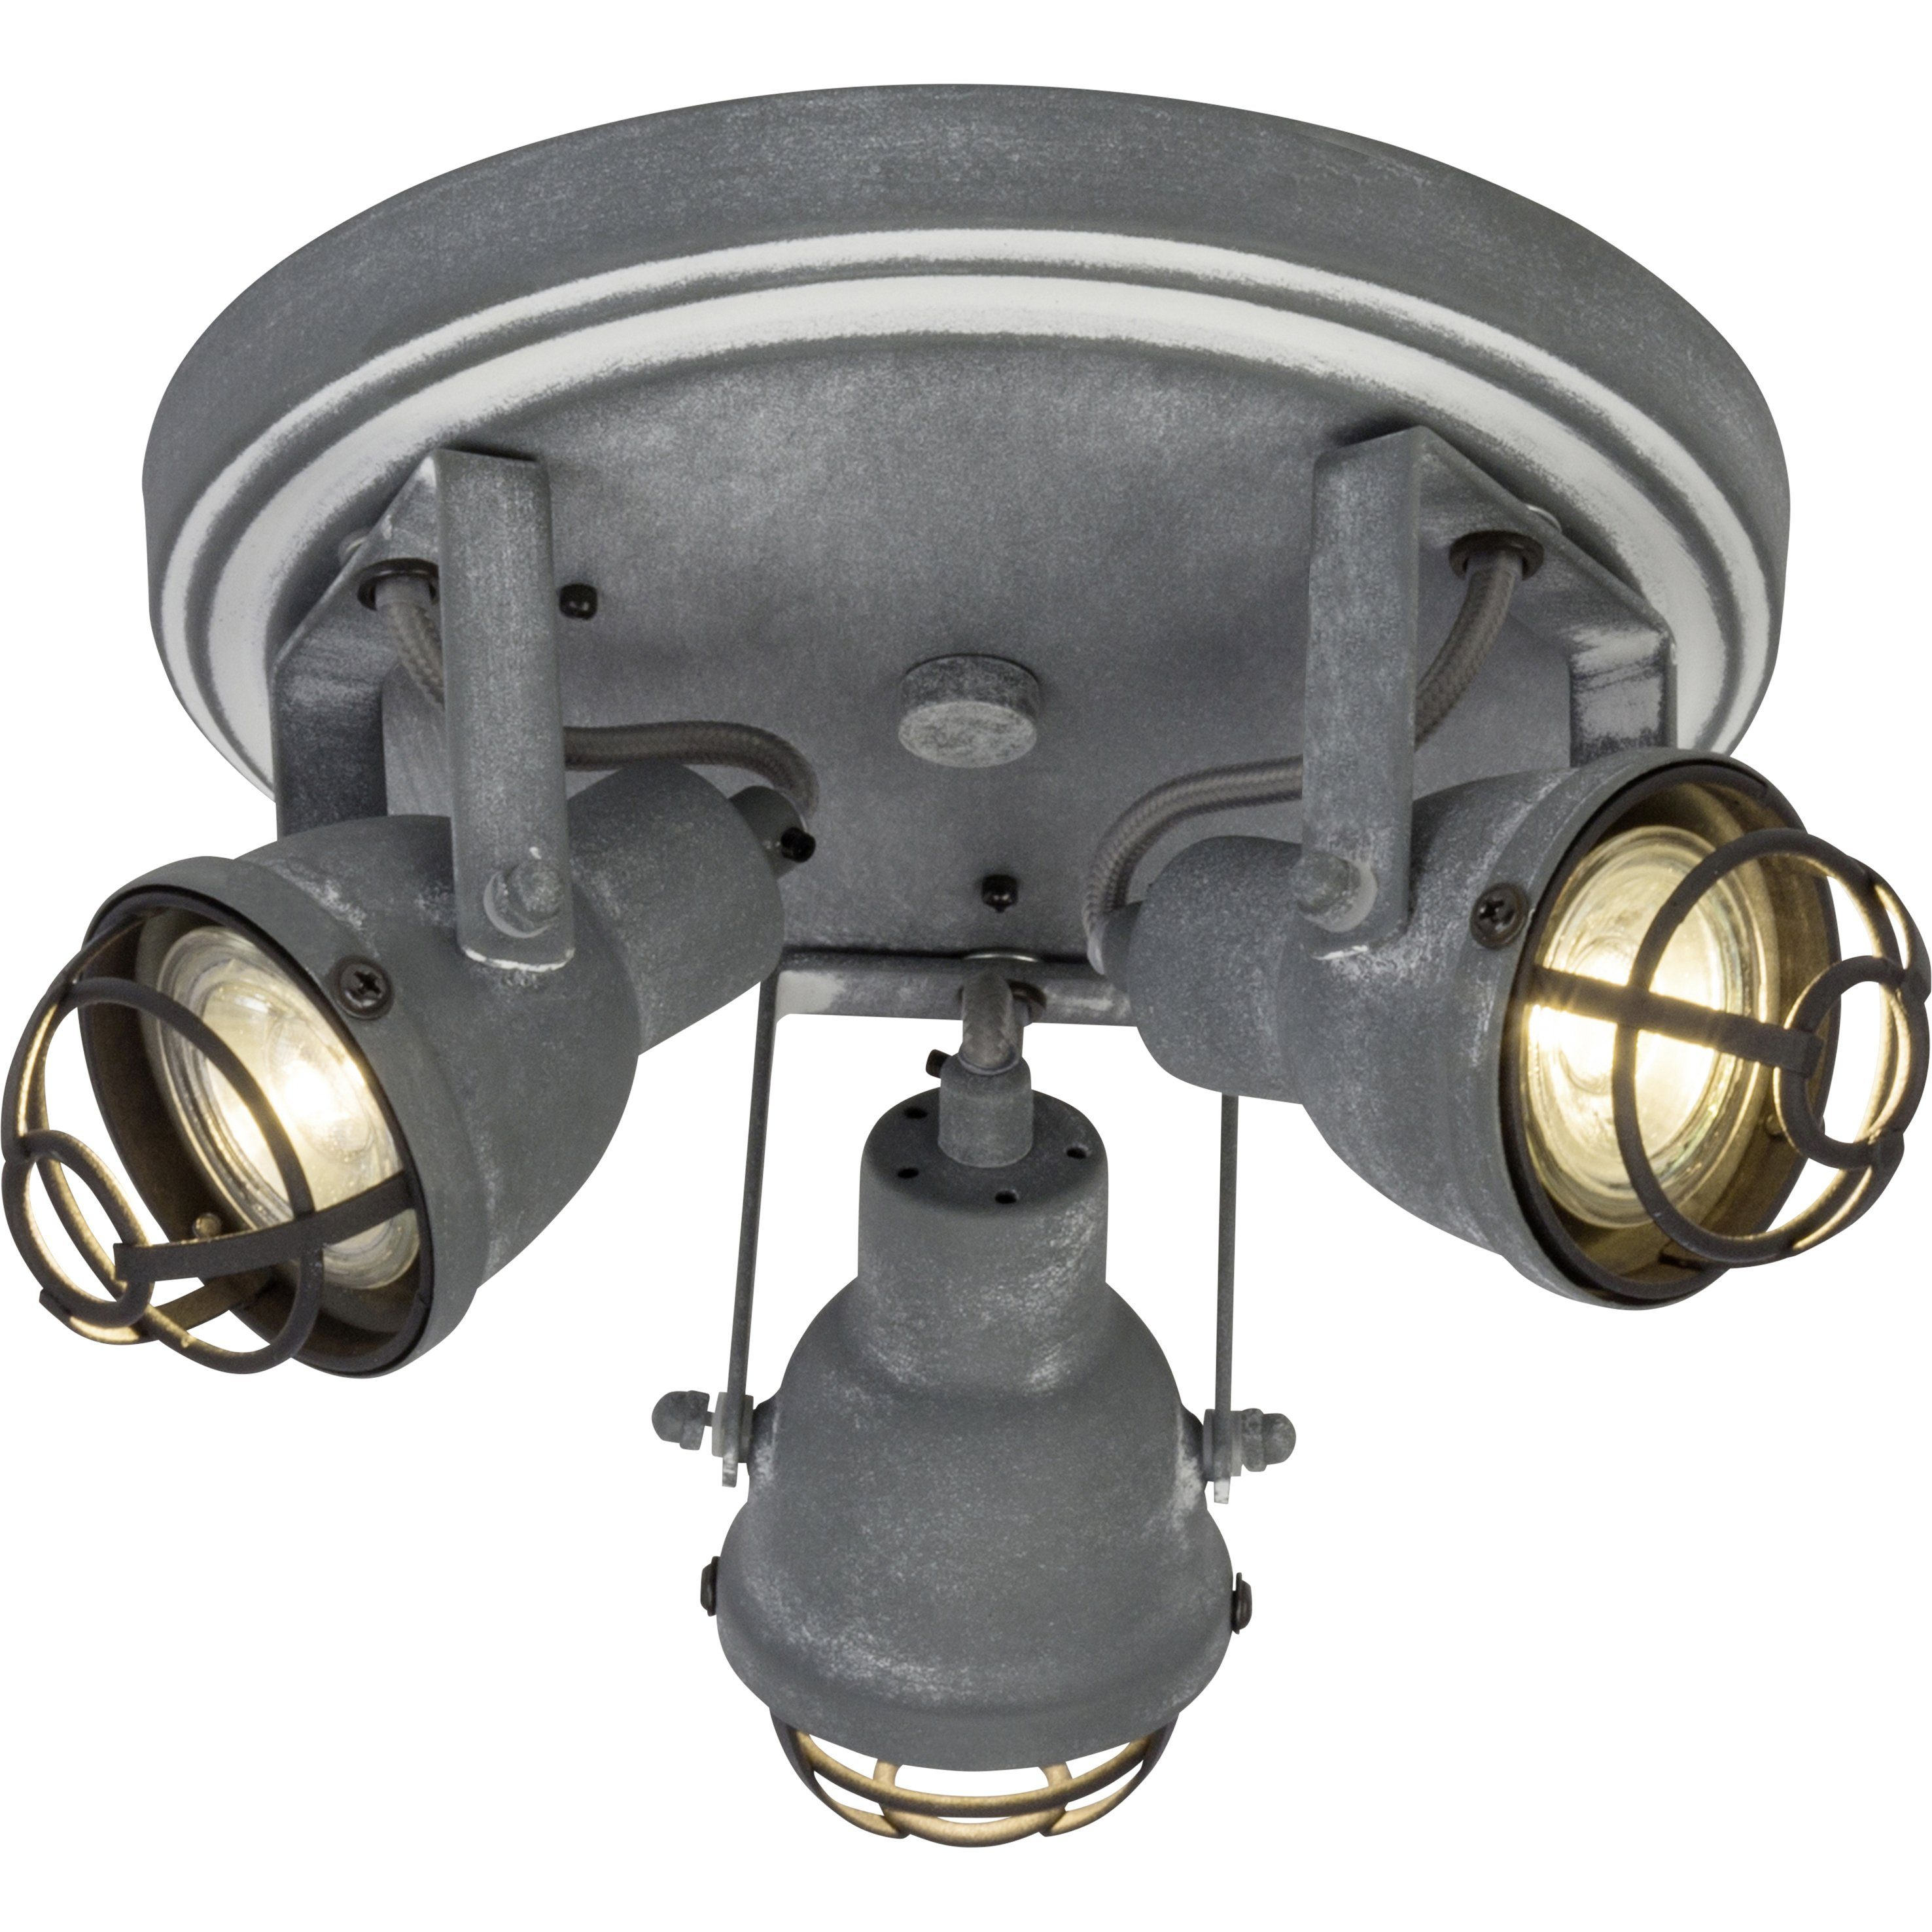 Brilliant Leuchten Bente LED Spotrondell 3flg grau Beton